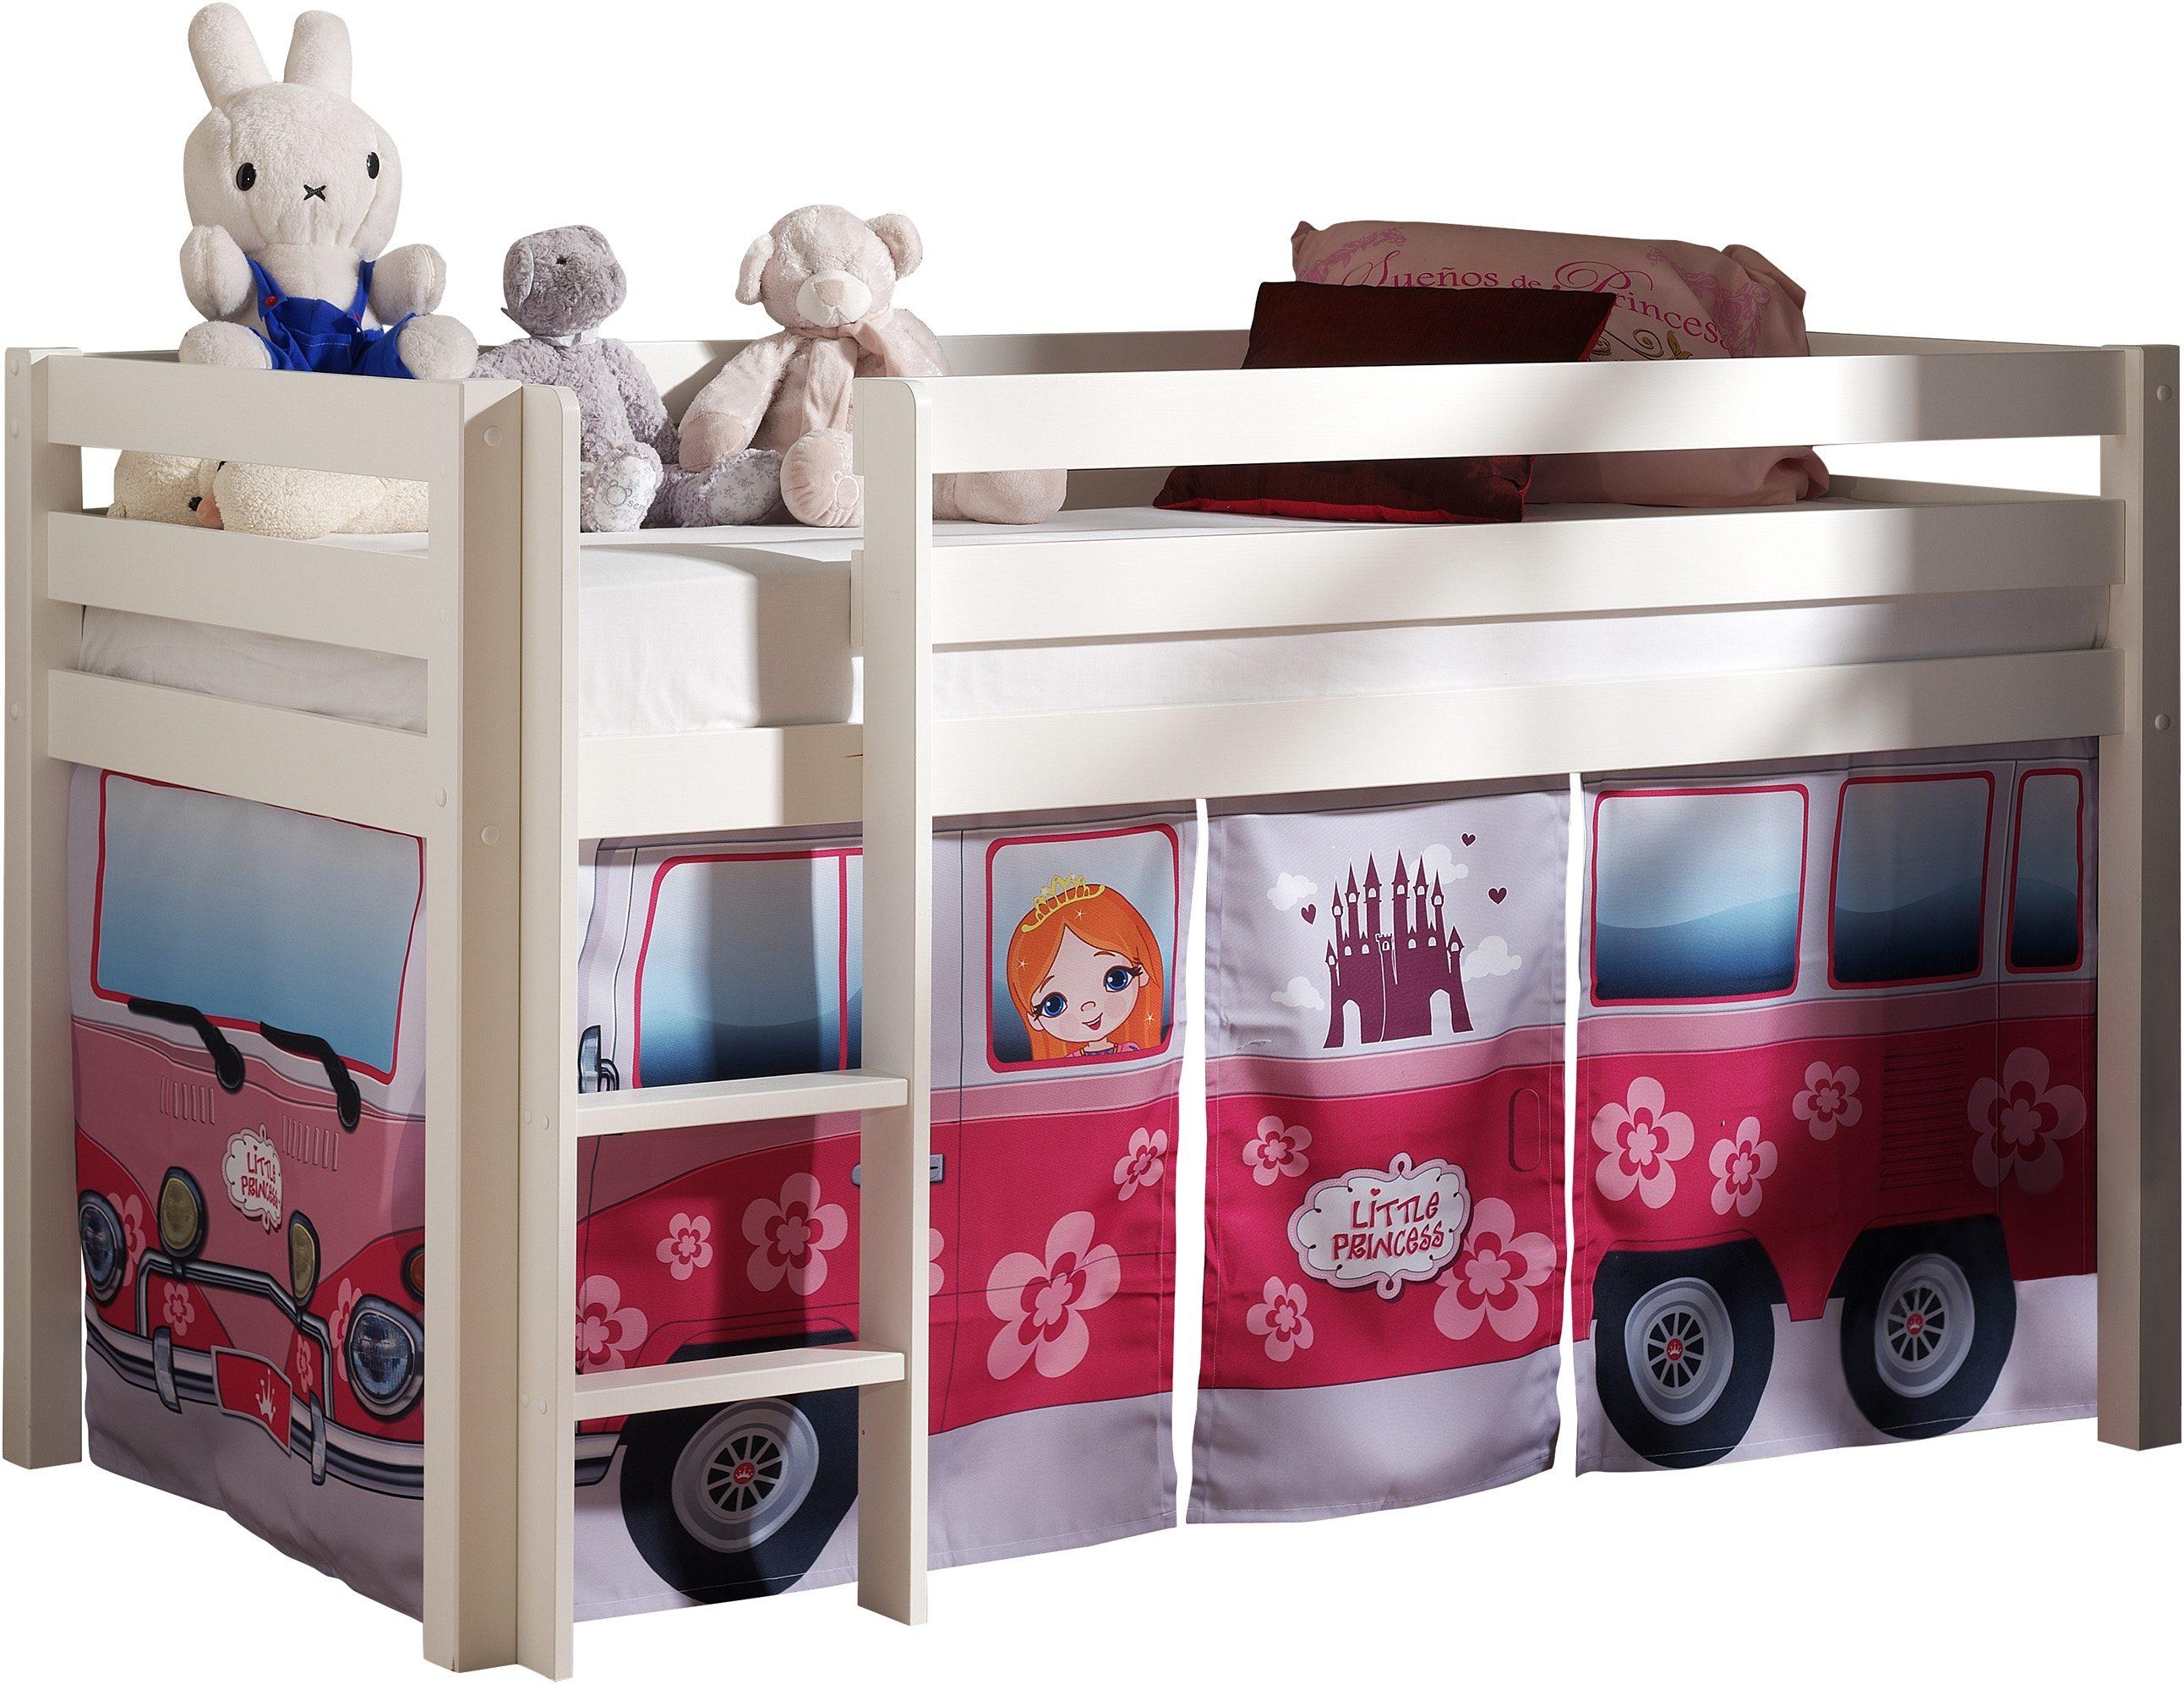 Hochbett Vipack Furniture | Kinderzimmer > Kinderbetten > Hochbetten | Massiver - Kiefer | Vipack Furniture